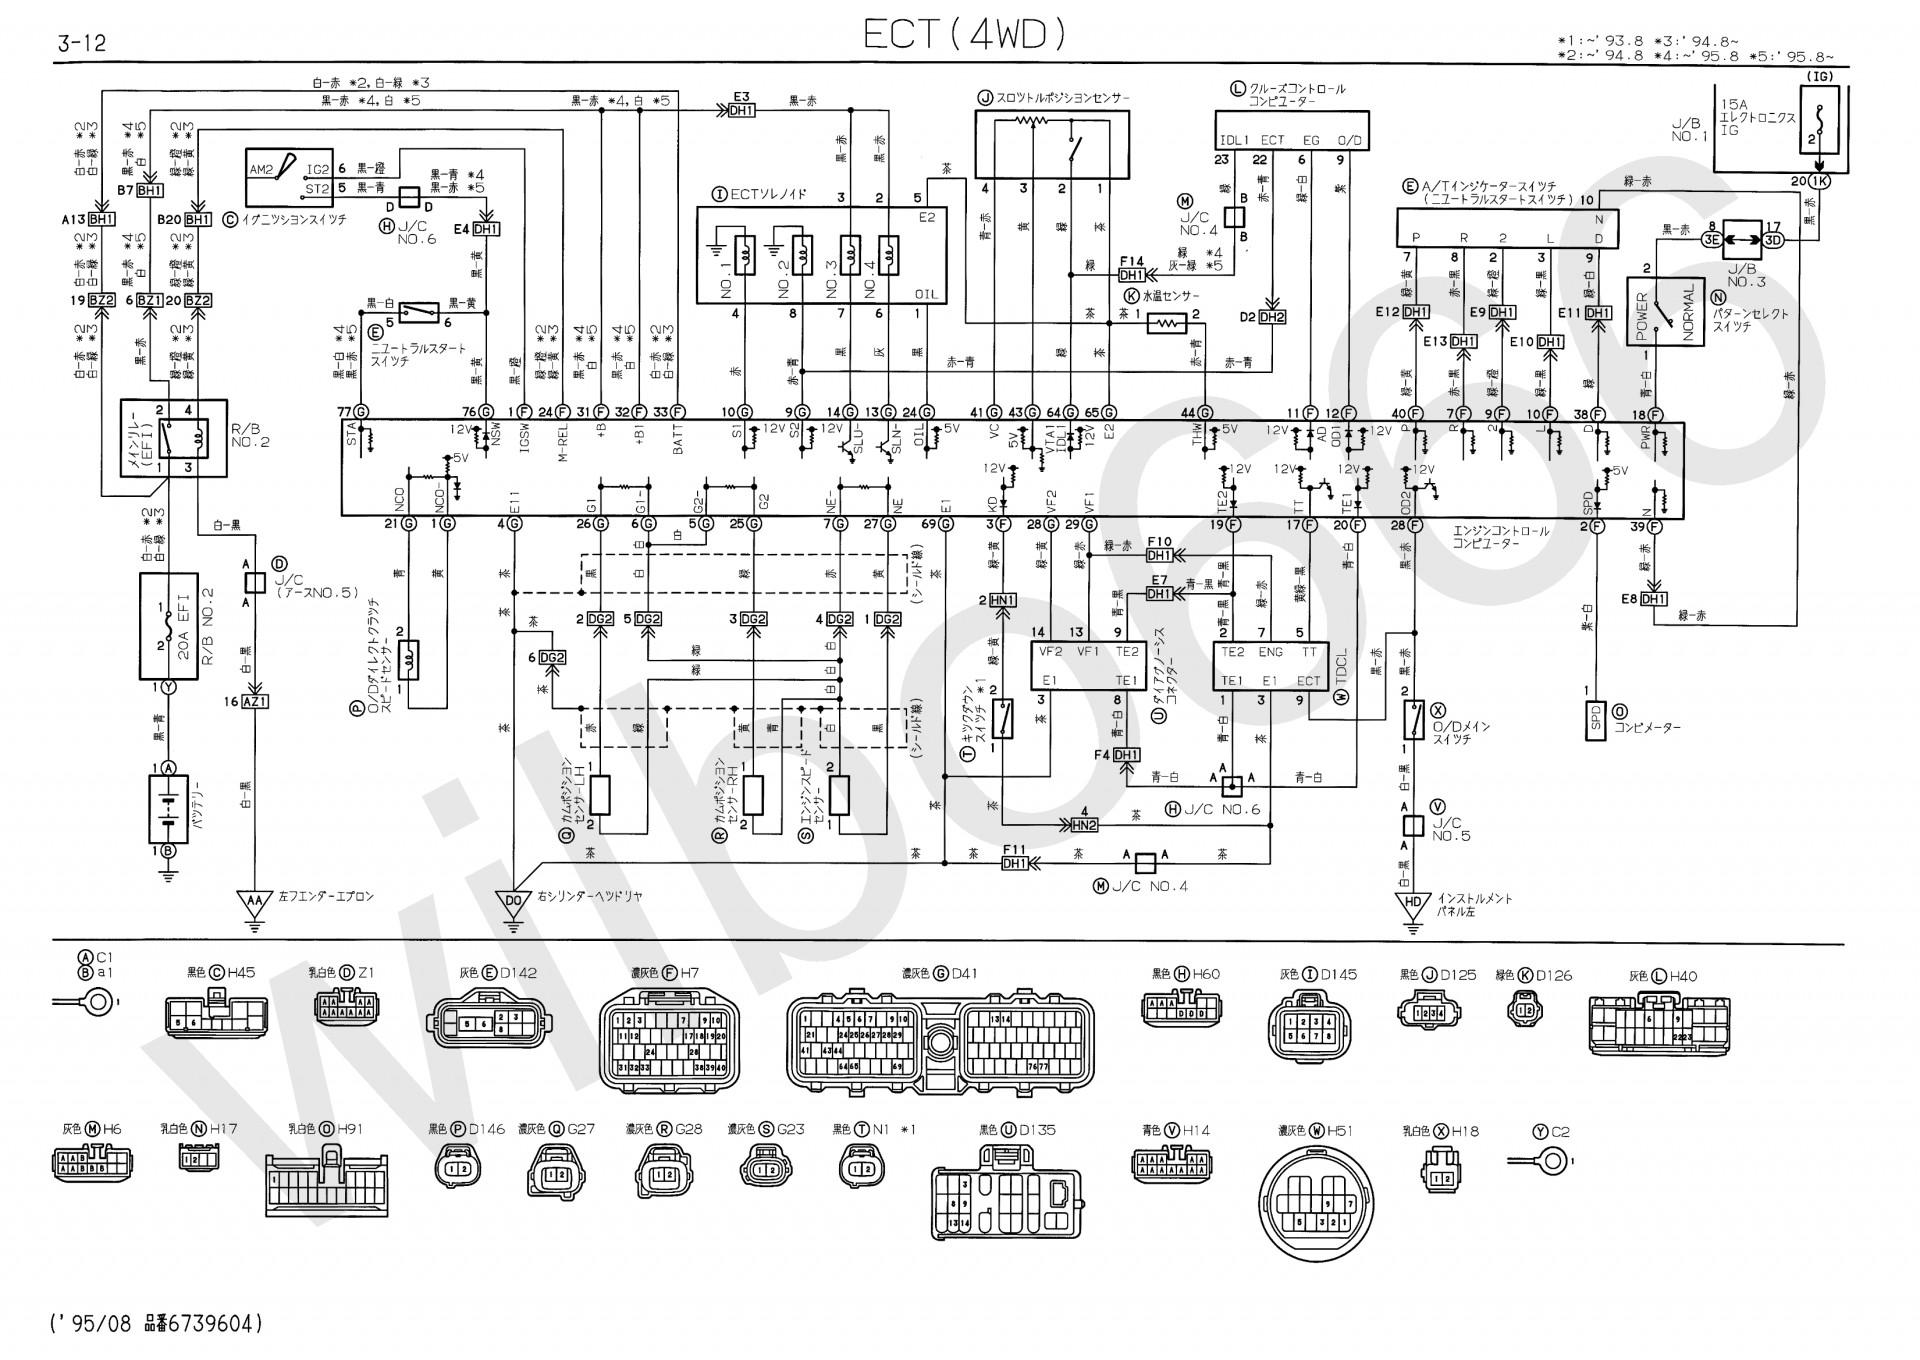 Engineering Block Diagram Diagram Wiring Harness Repair Guides Diagrams Autozone B16 Of Engineering Block Diagram